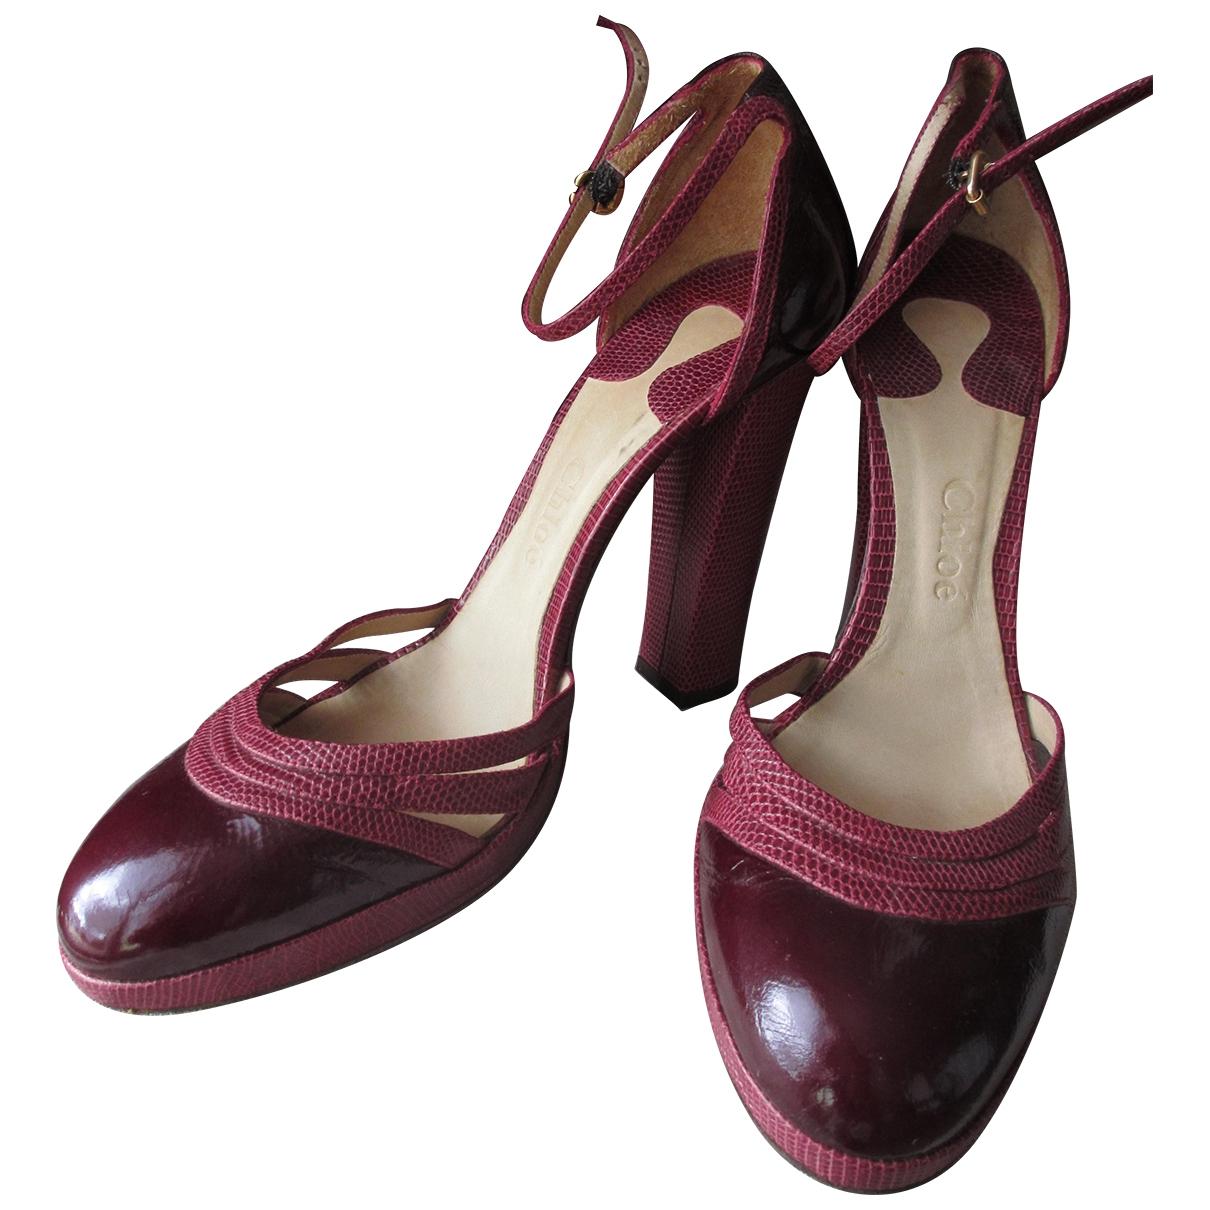 Chloé \N Burgundy Patent leather Heels for Women 40 EU